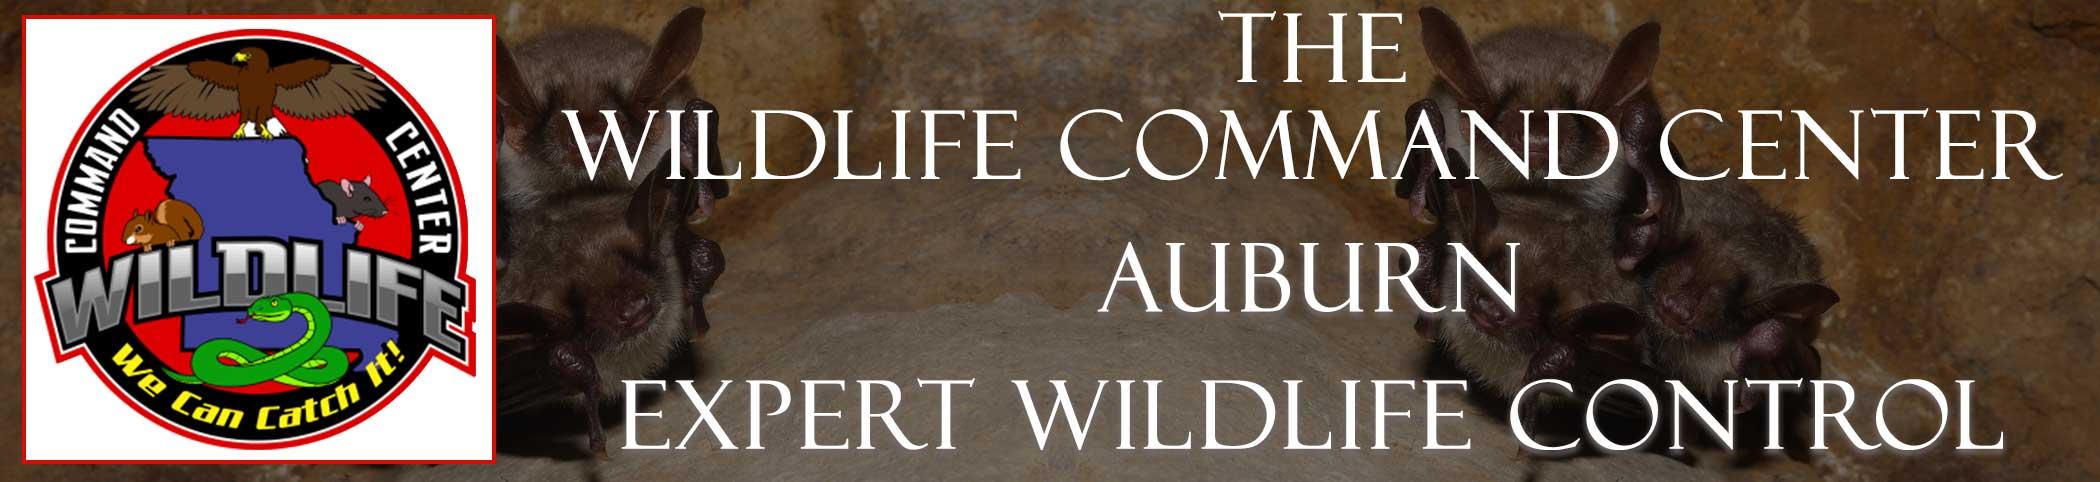 auburn-wildlife-command-center